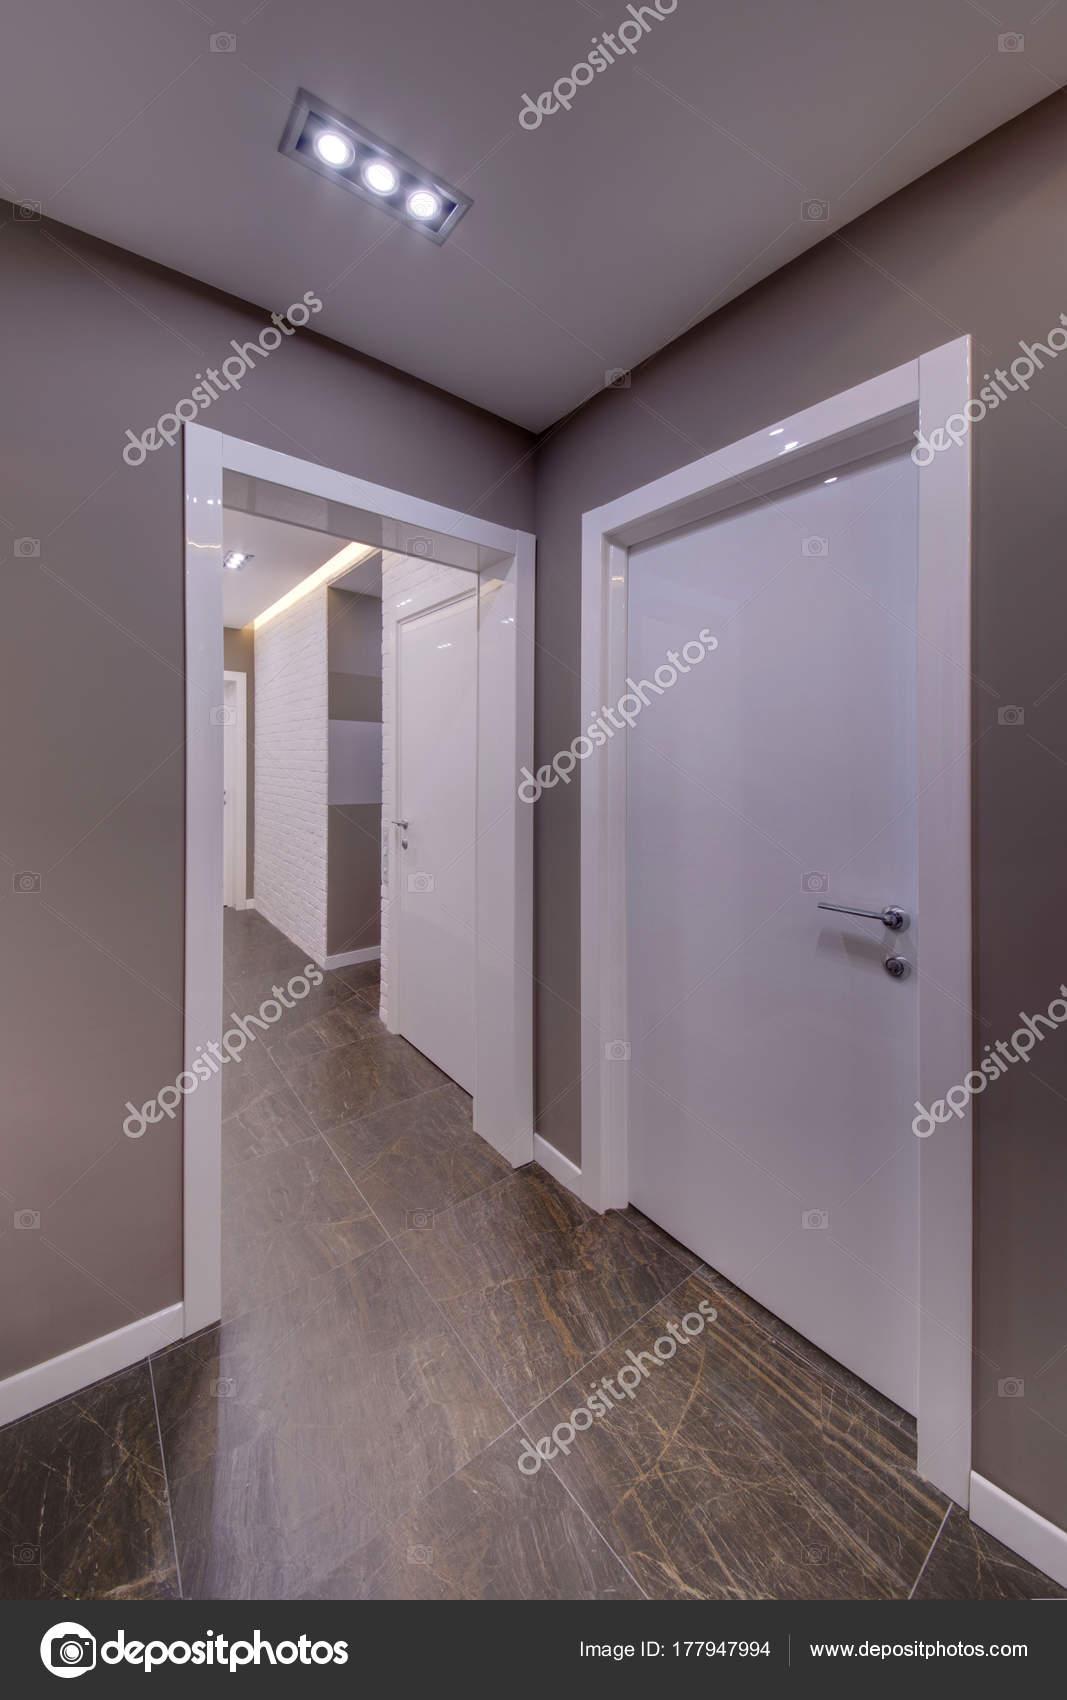 Suelo gris puertas blancas fabulous estilo paredes for Puertas blancas paredes grises